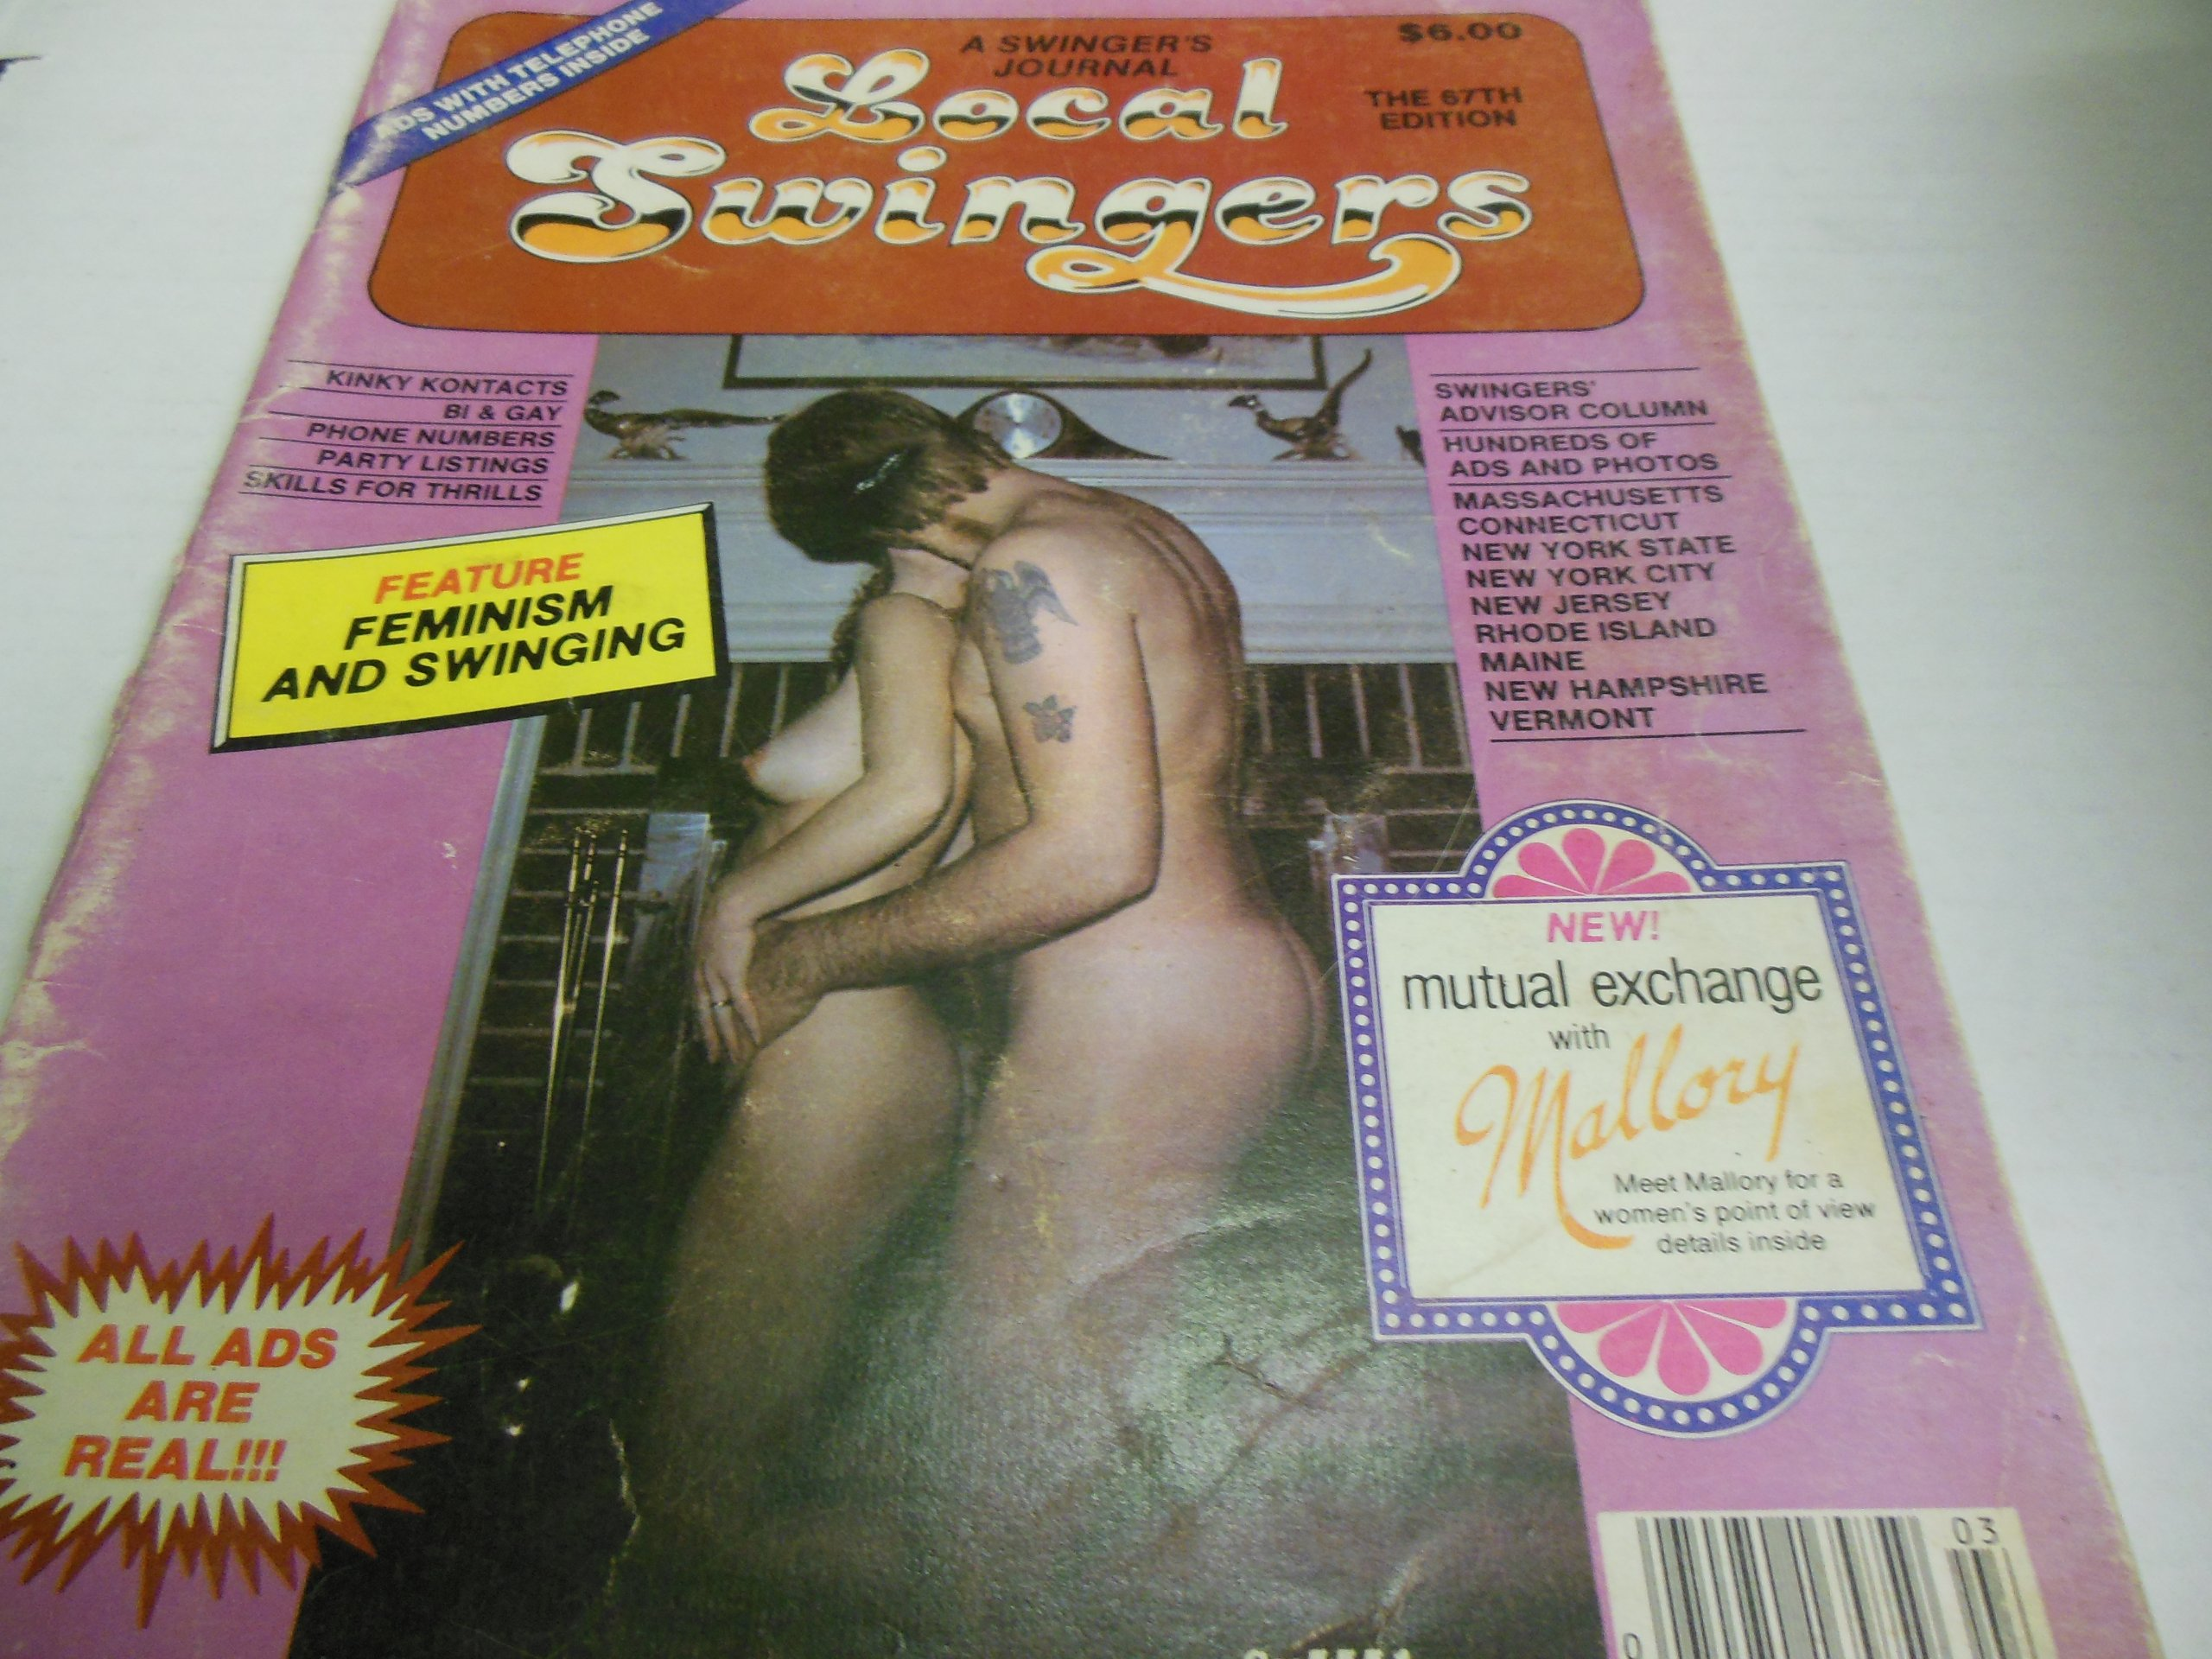 Art gallery nude photo woman